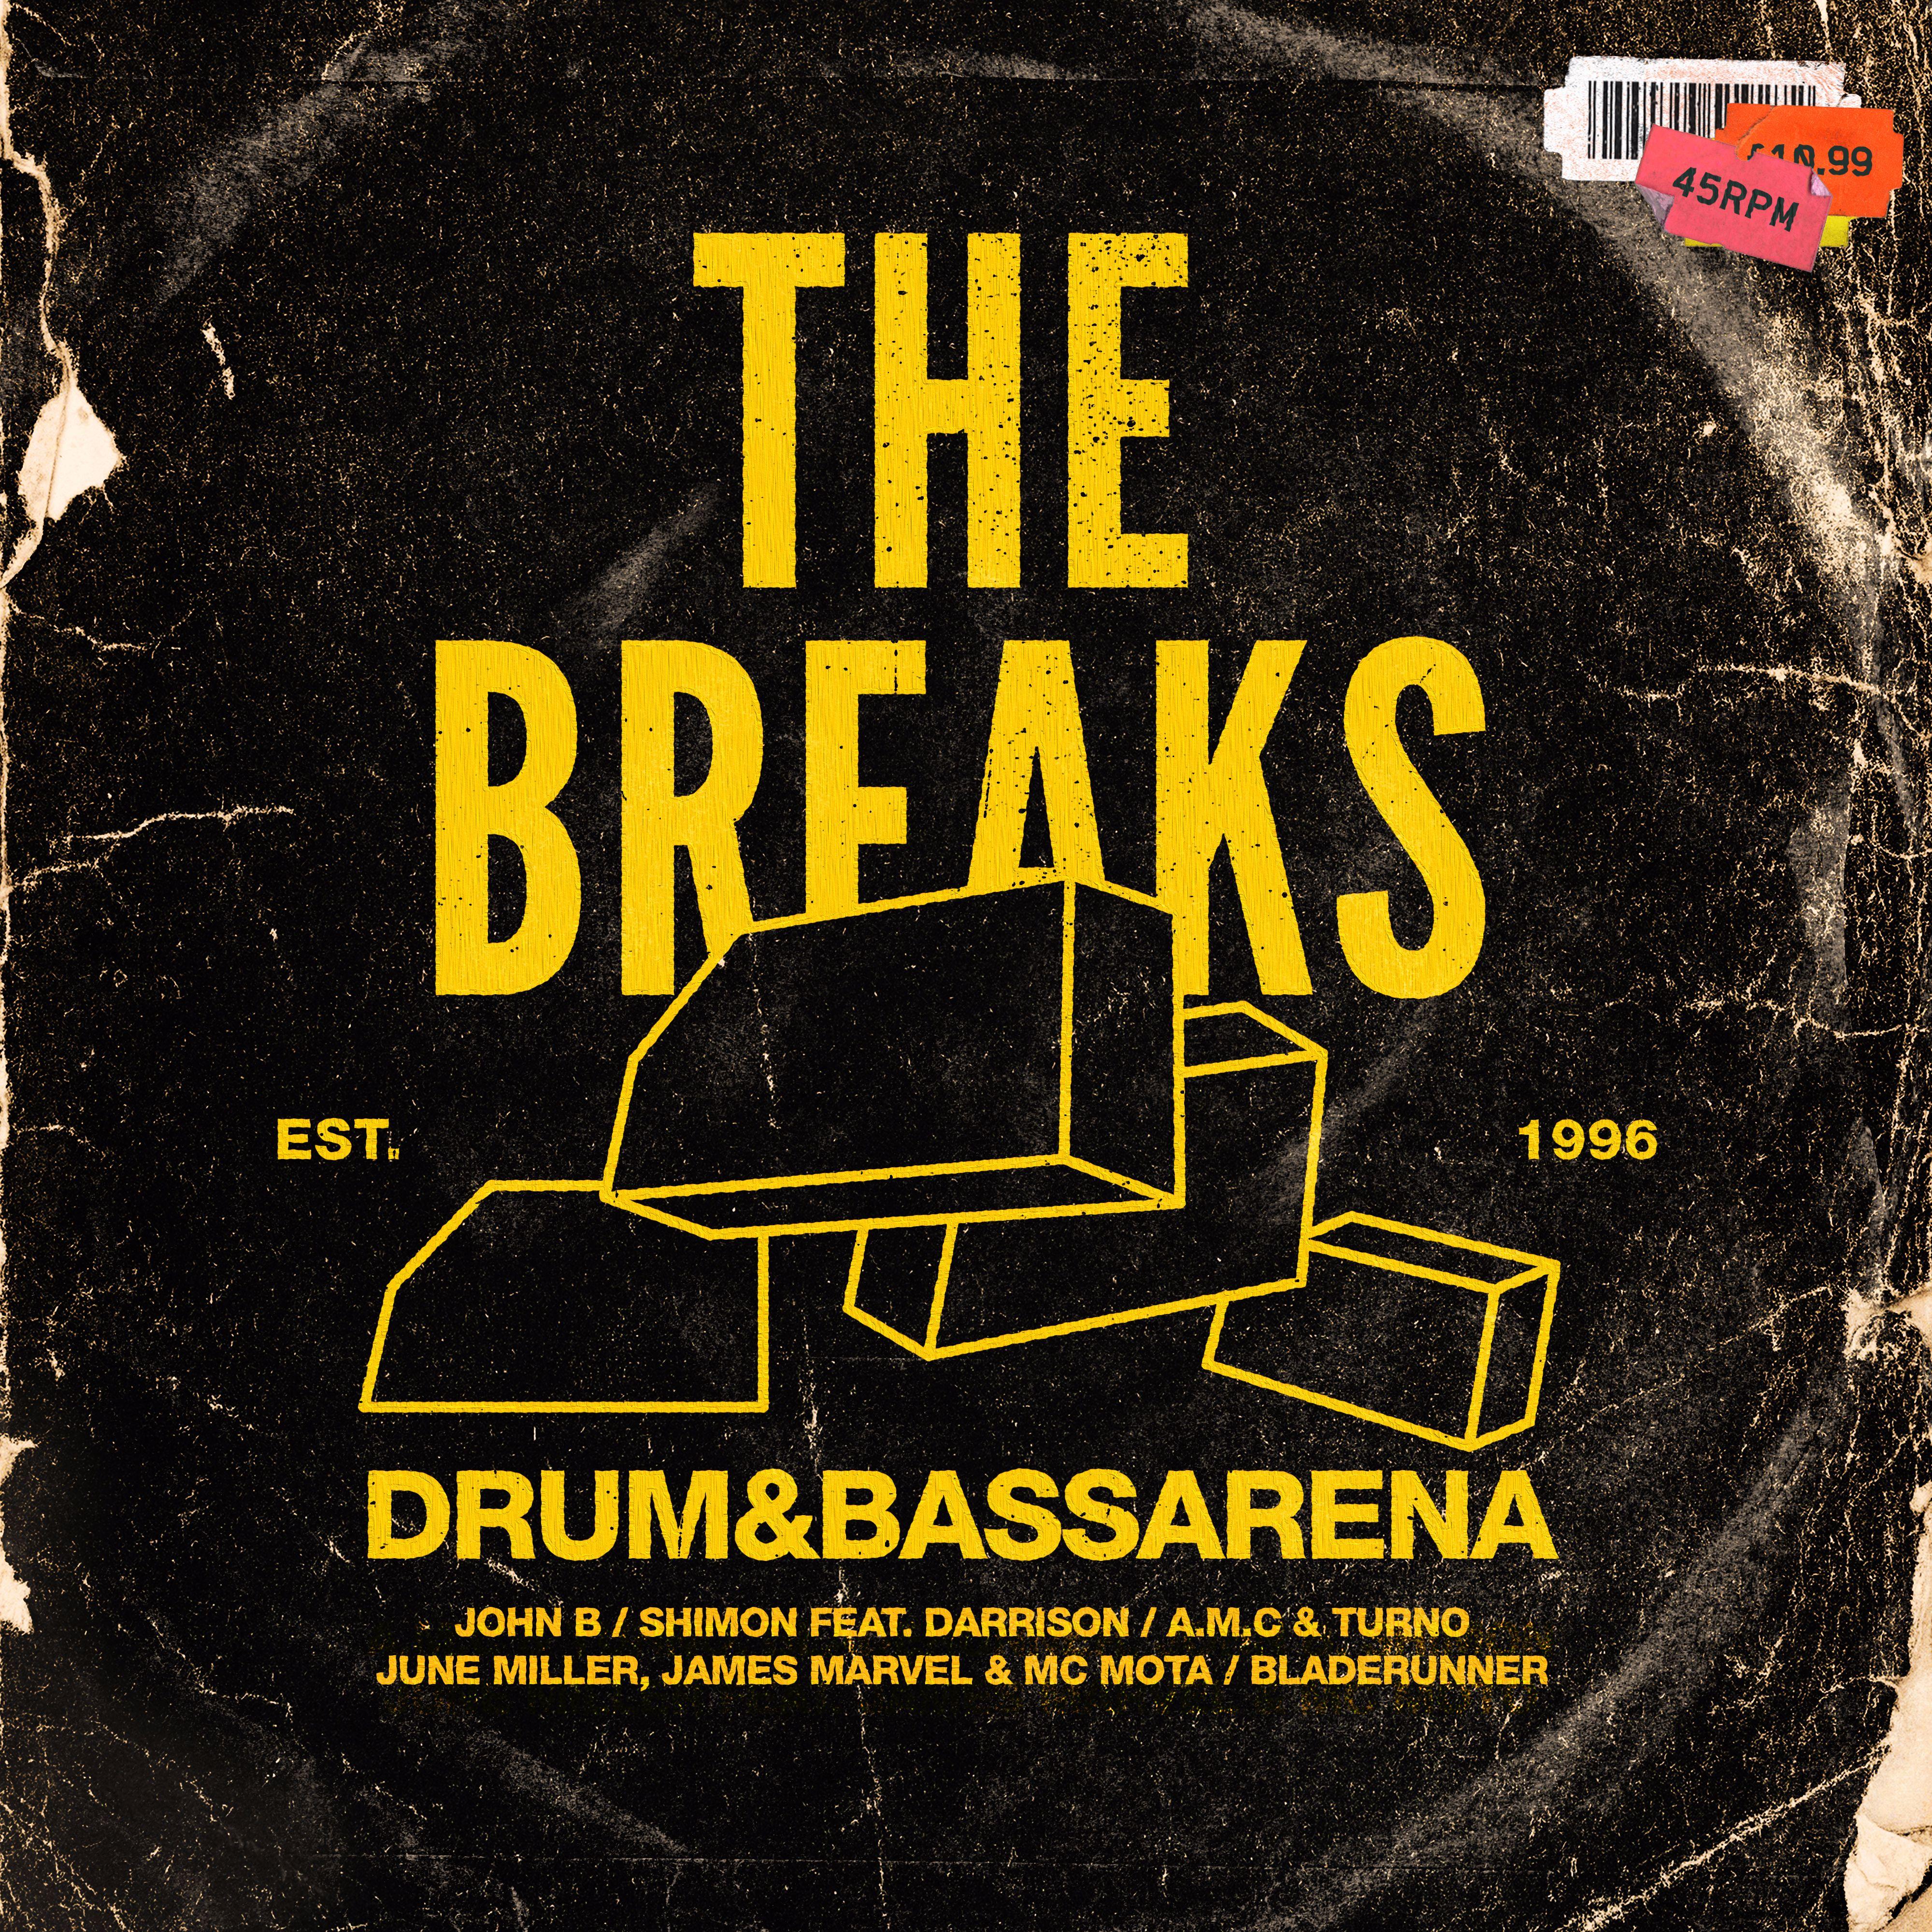 John B - Drum 'N' Bass Visions